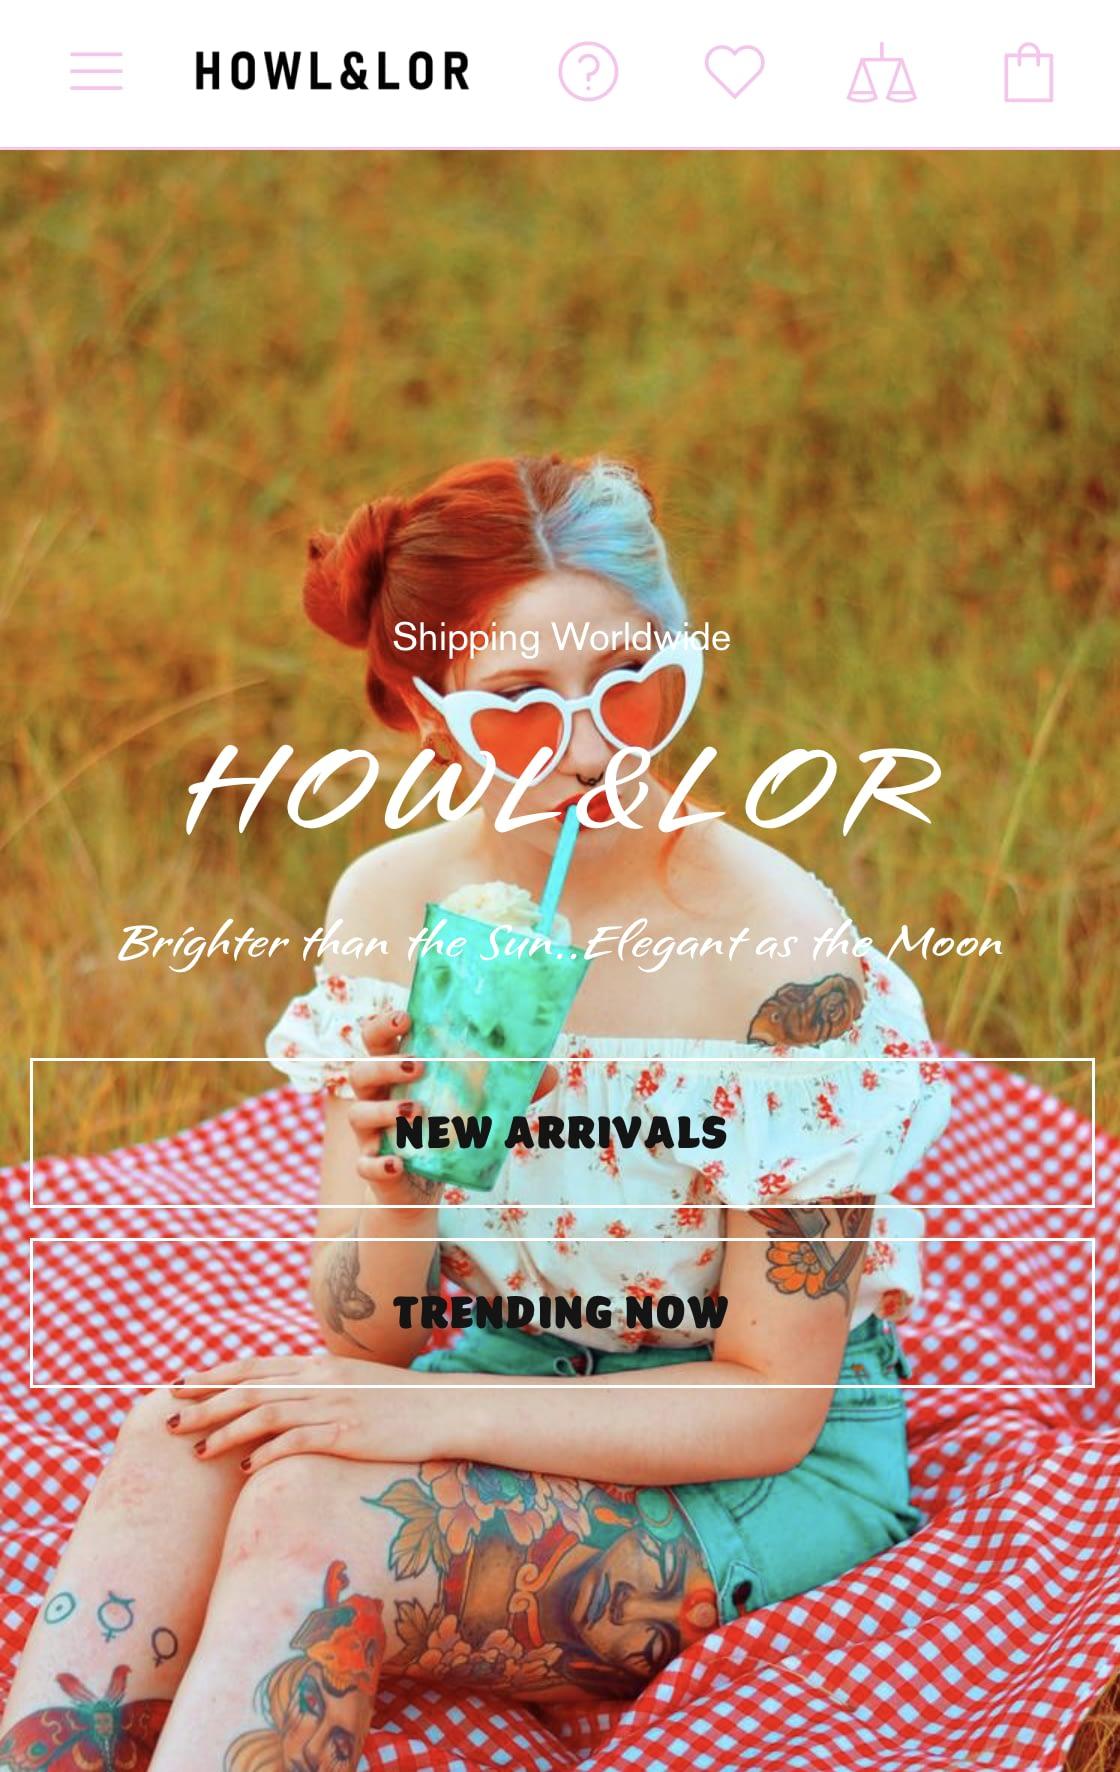 Howlnlor